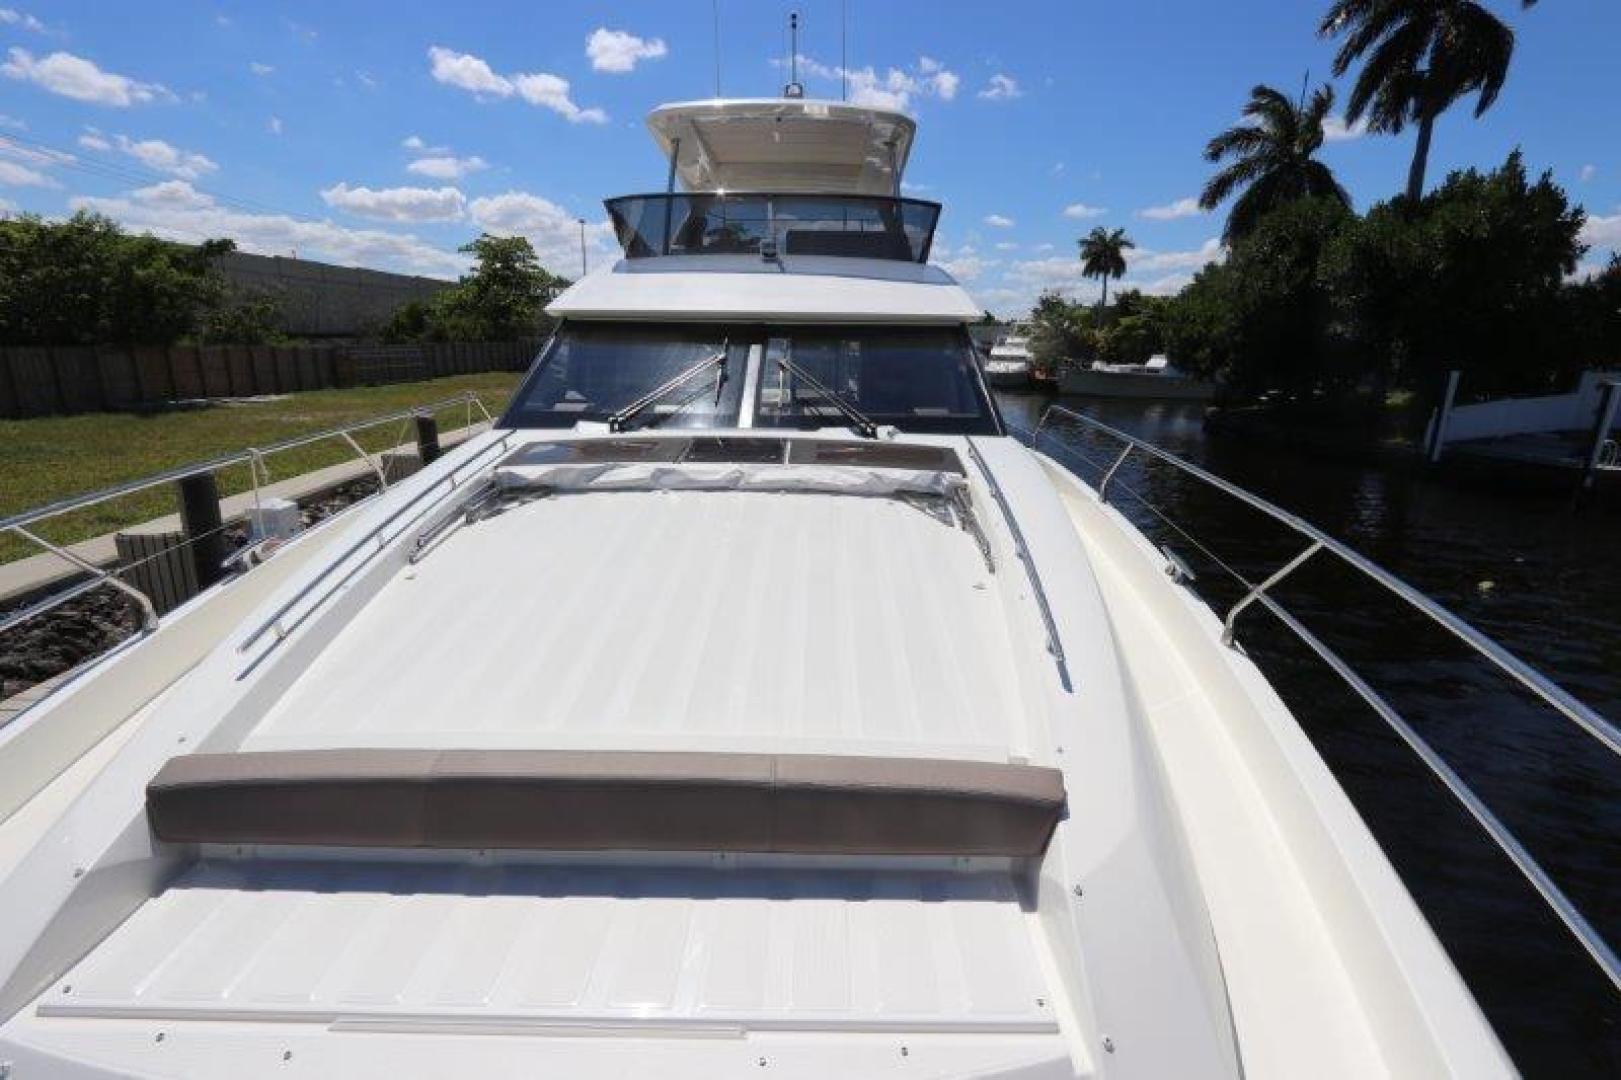 Prestige-Motoryacht 2017-Breathe Easy Fort Lauderdale-Florida-United States-1303867   Thumbnail